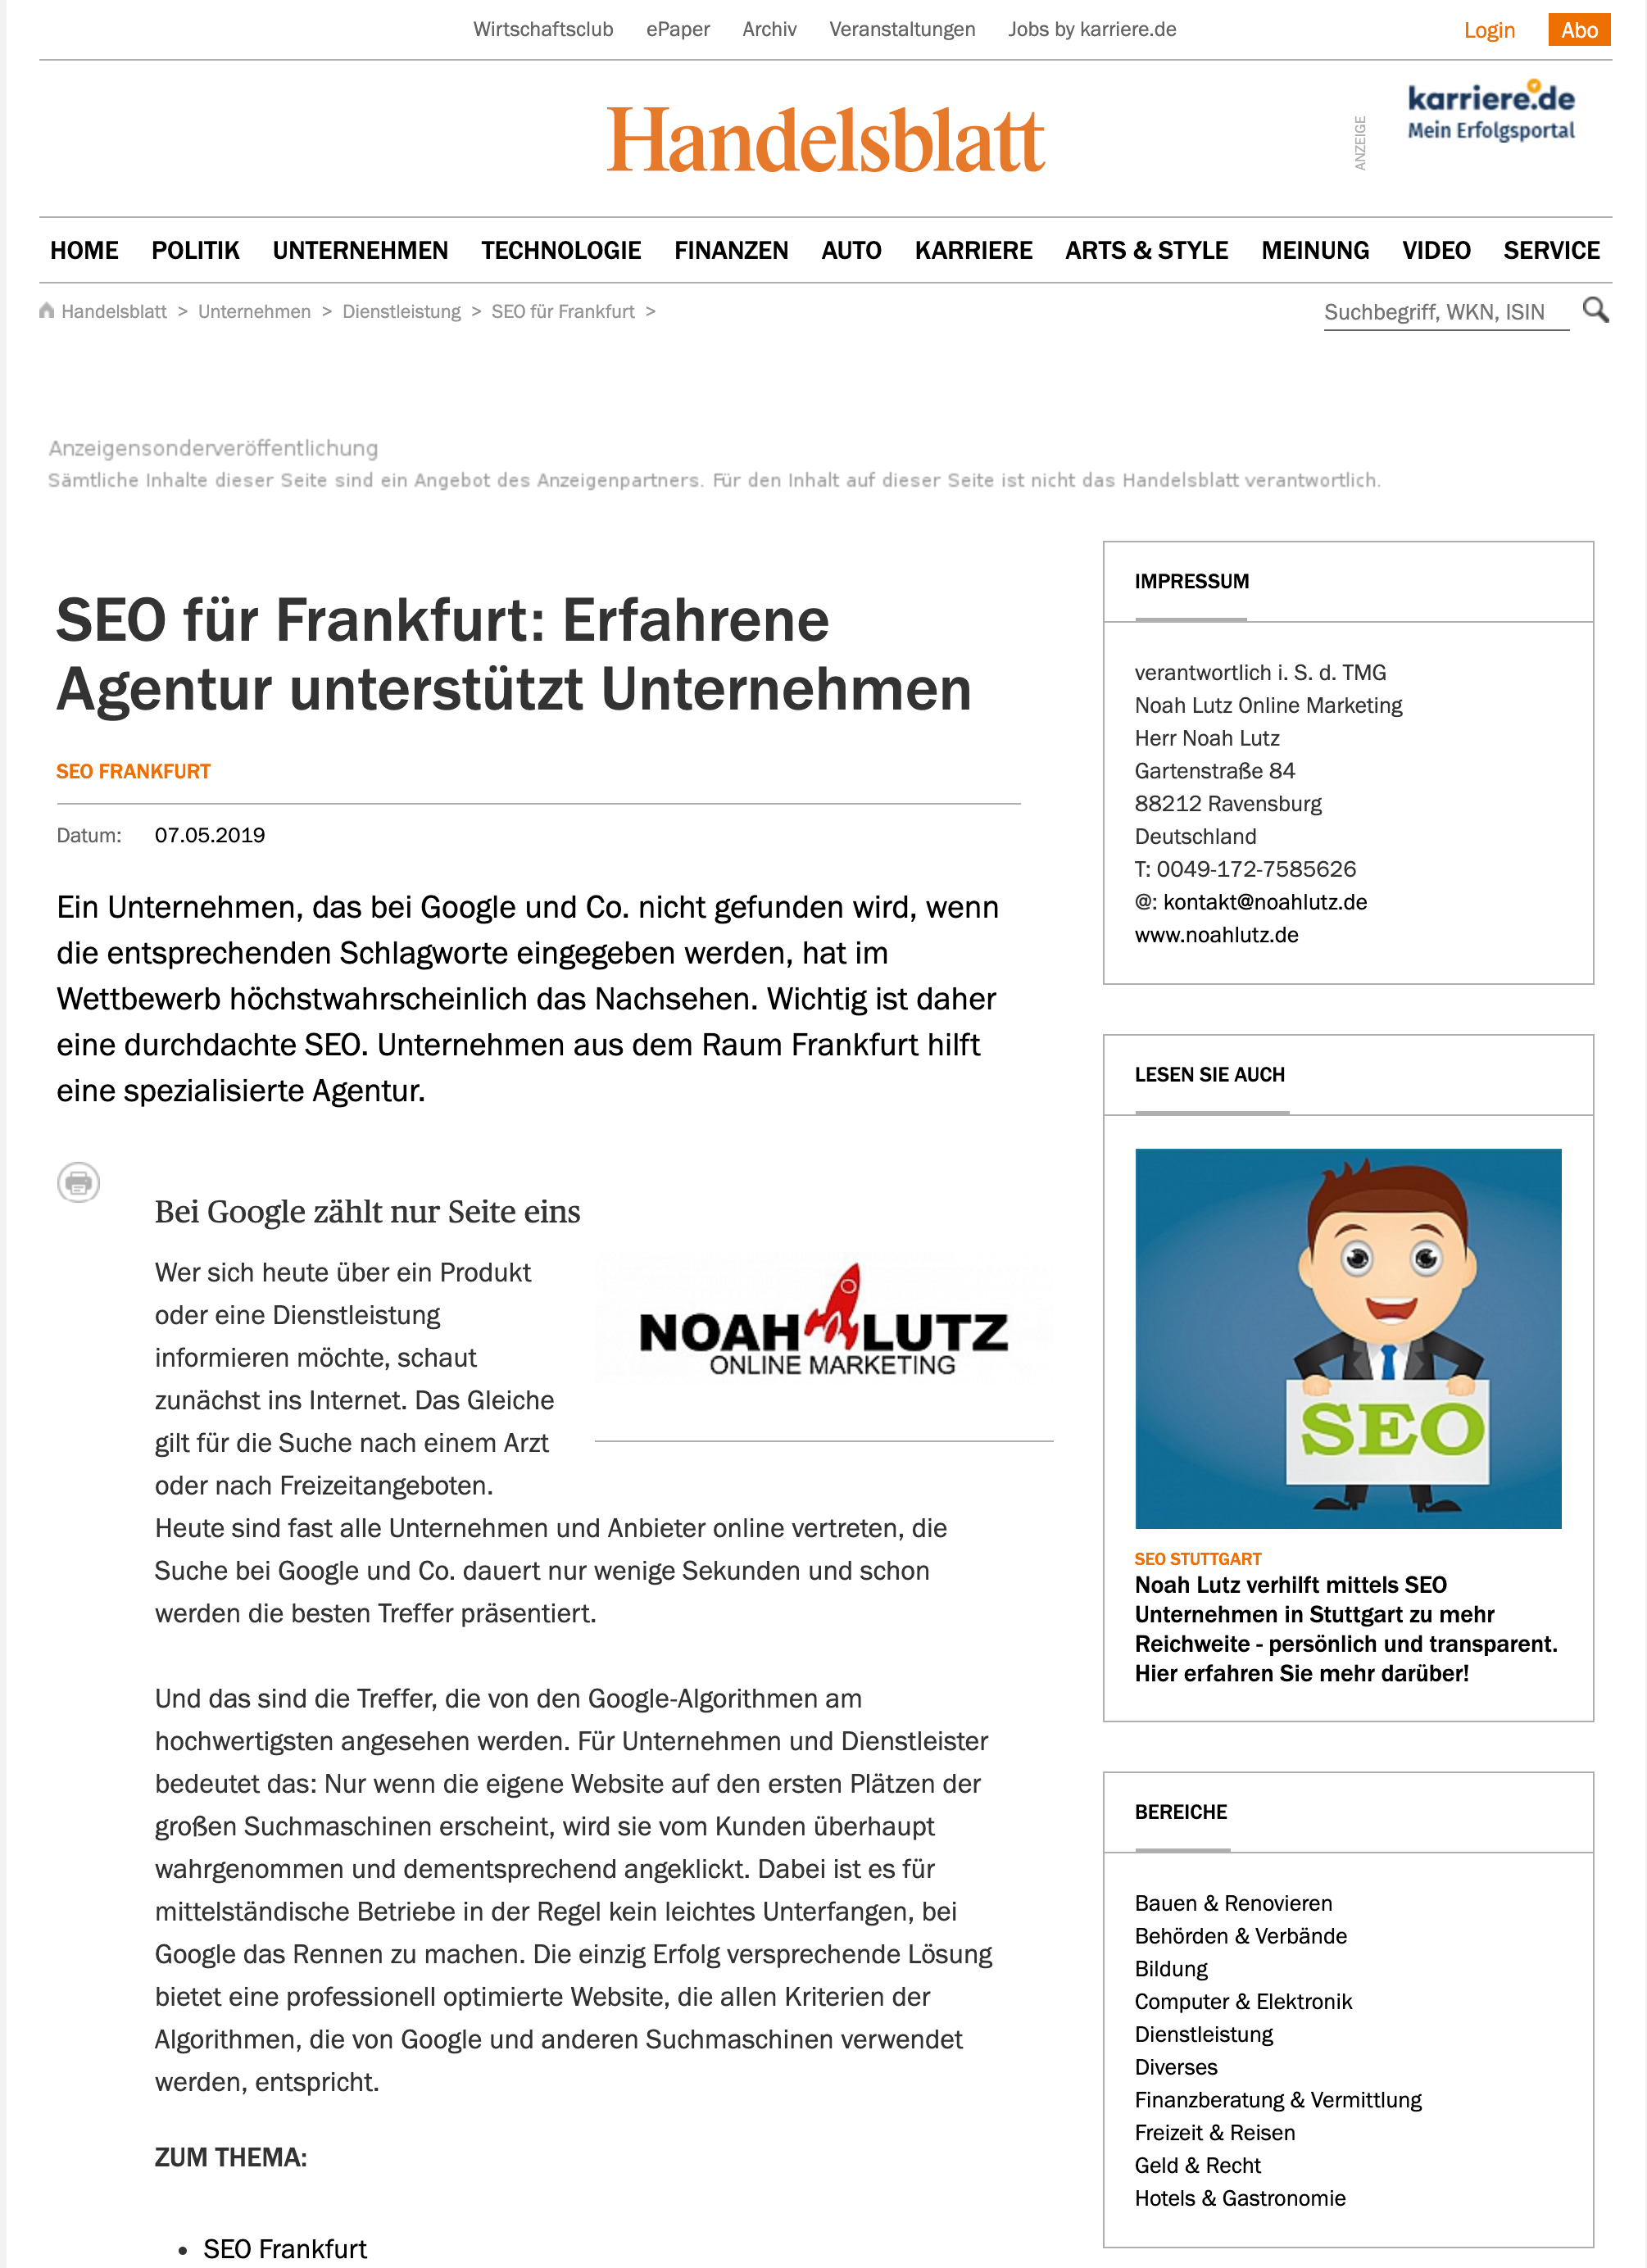 seo-frankfurt-handelsblatt-publikation.png